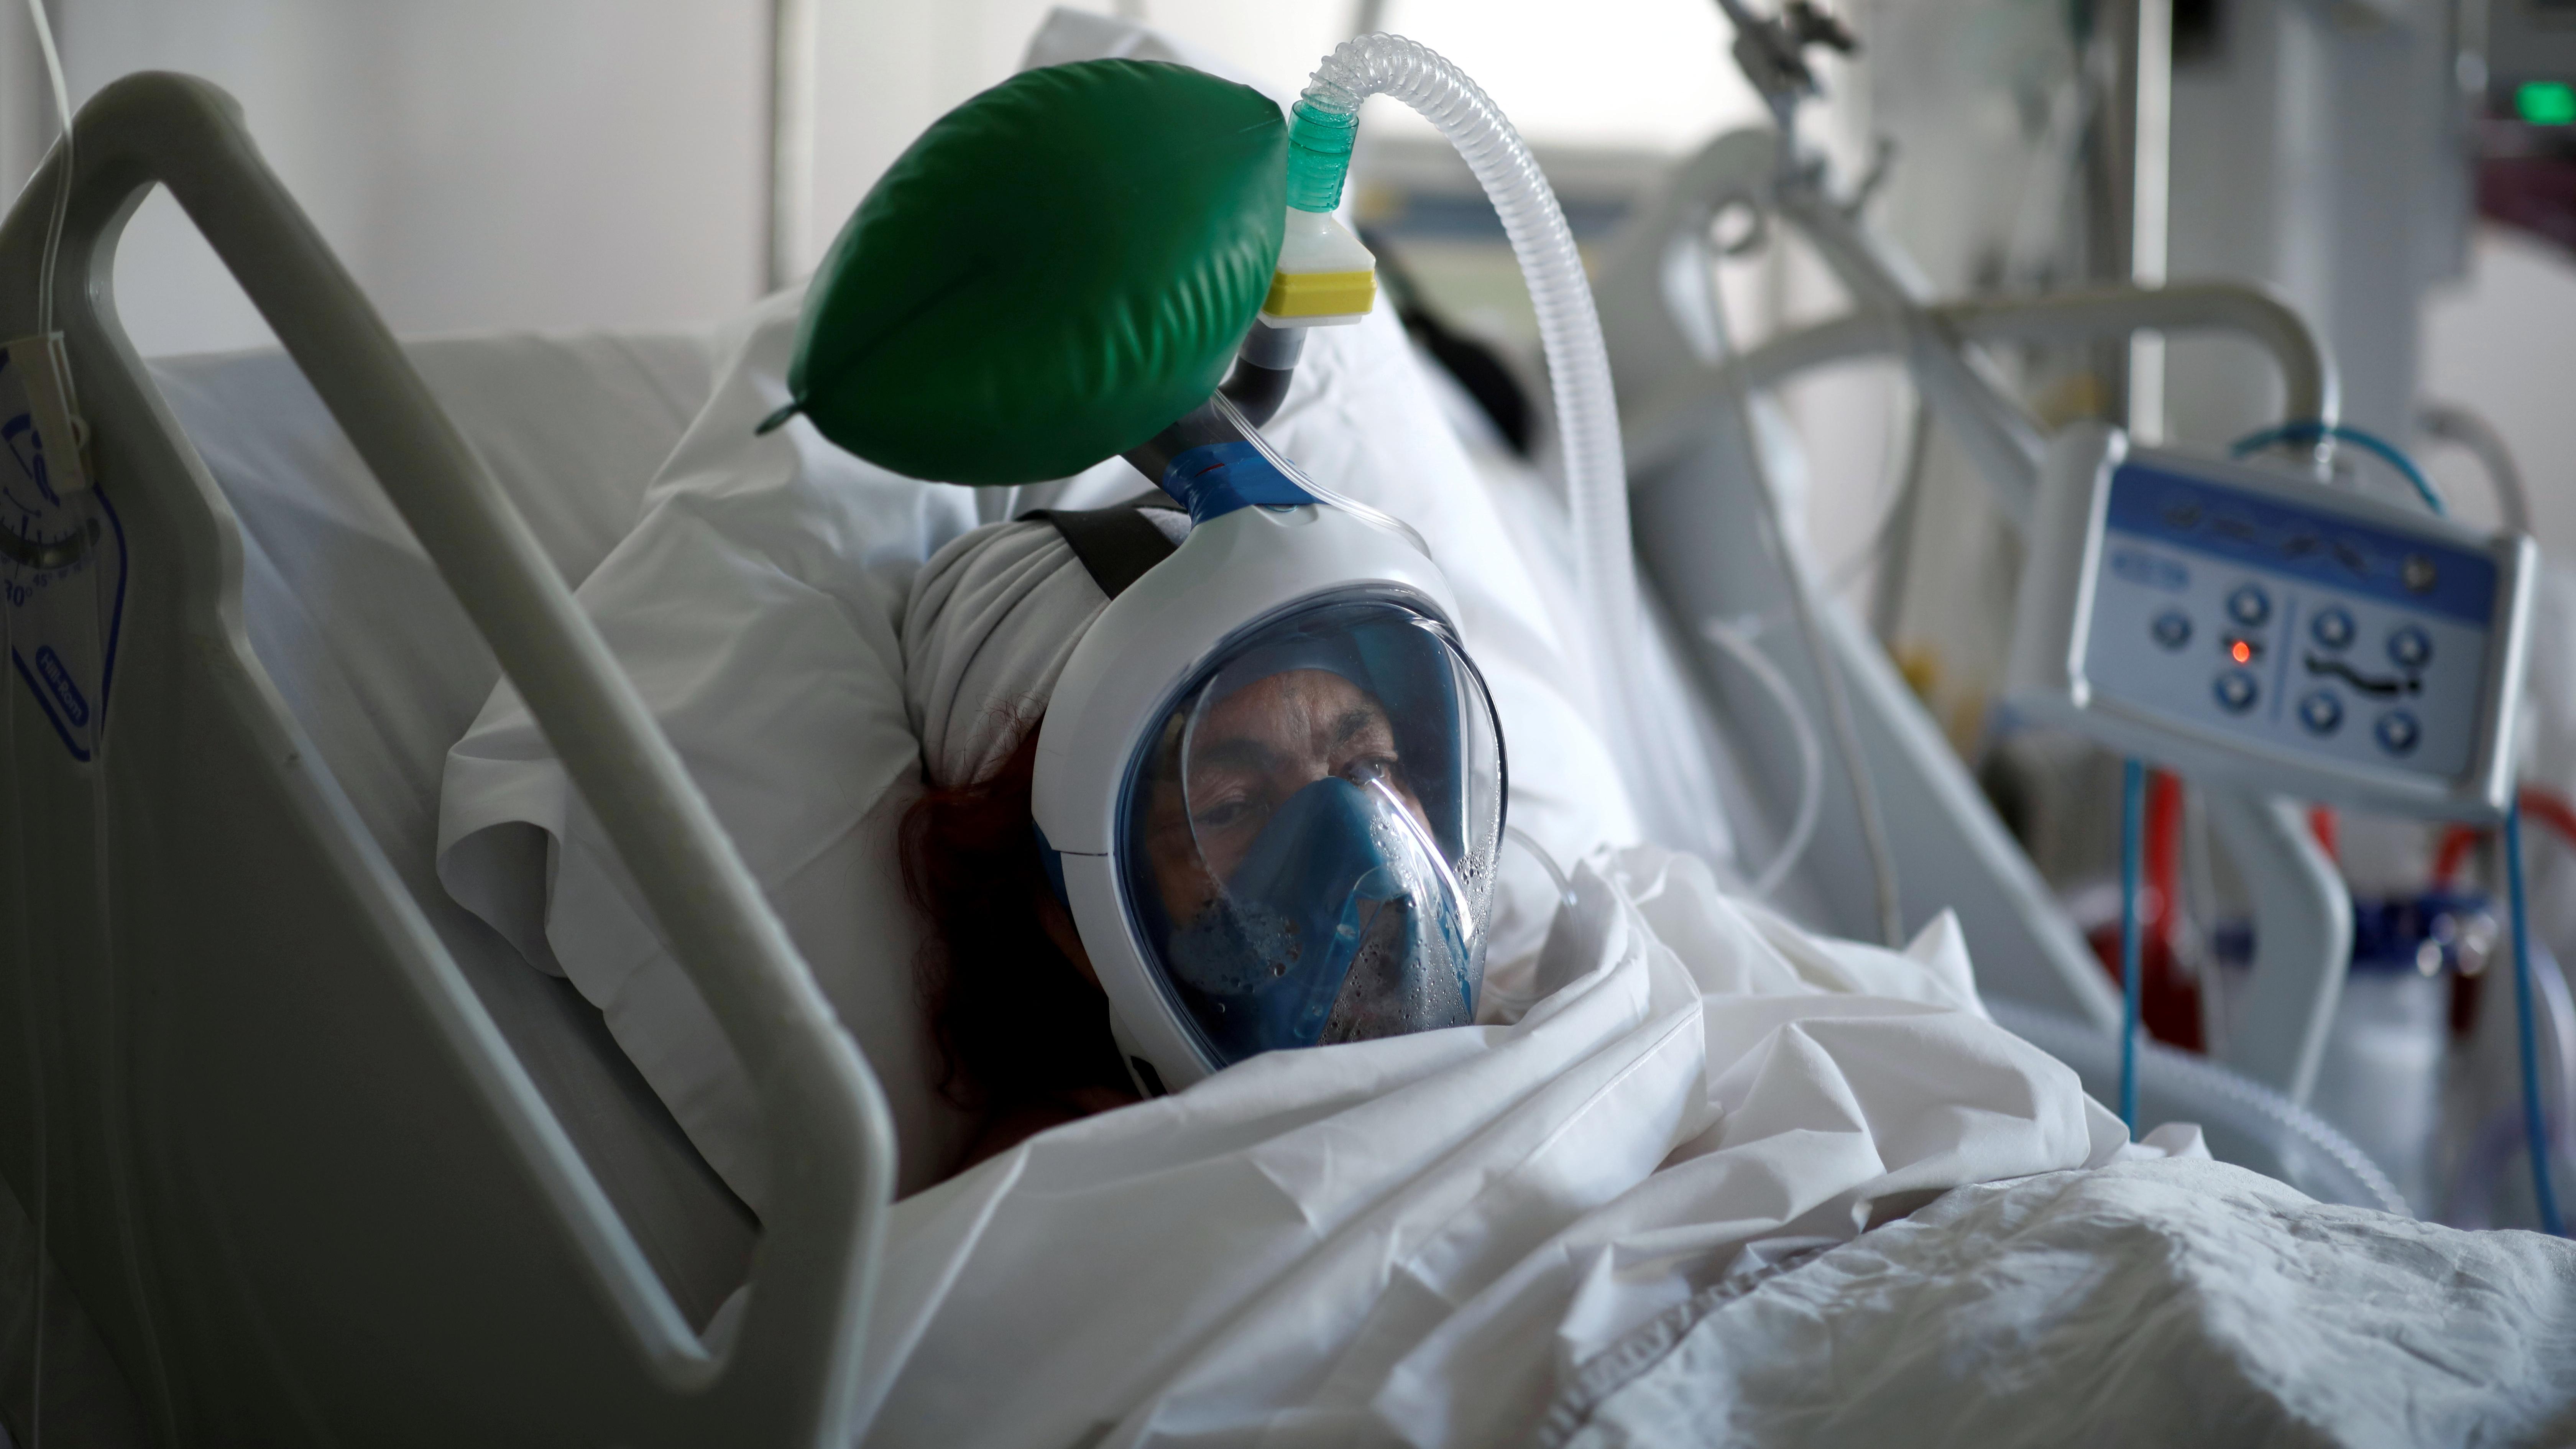 Doctors fighting coronavirus face a ventilator Catch-22 — Quartz